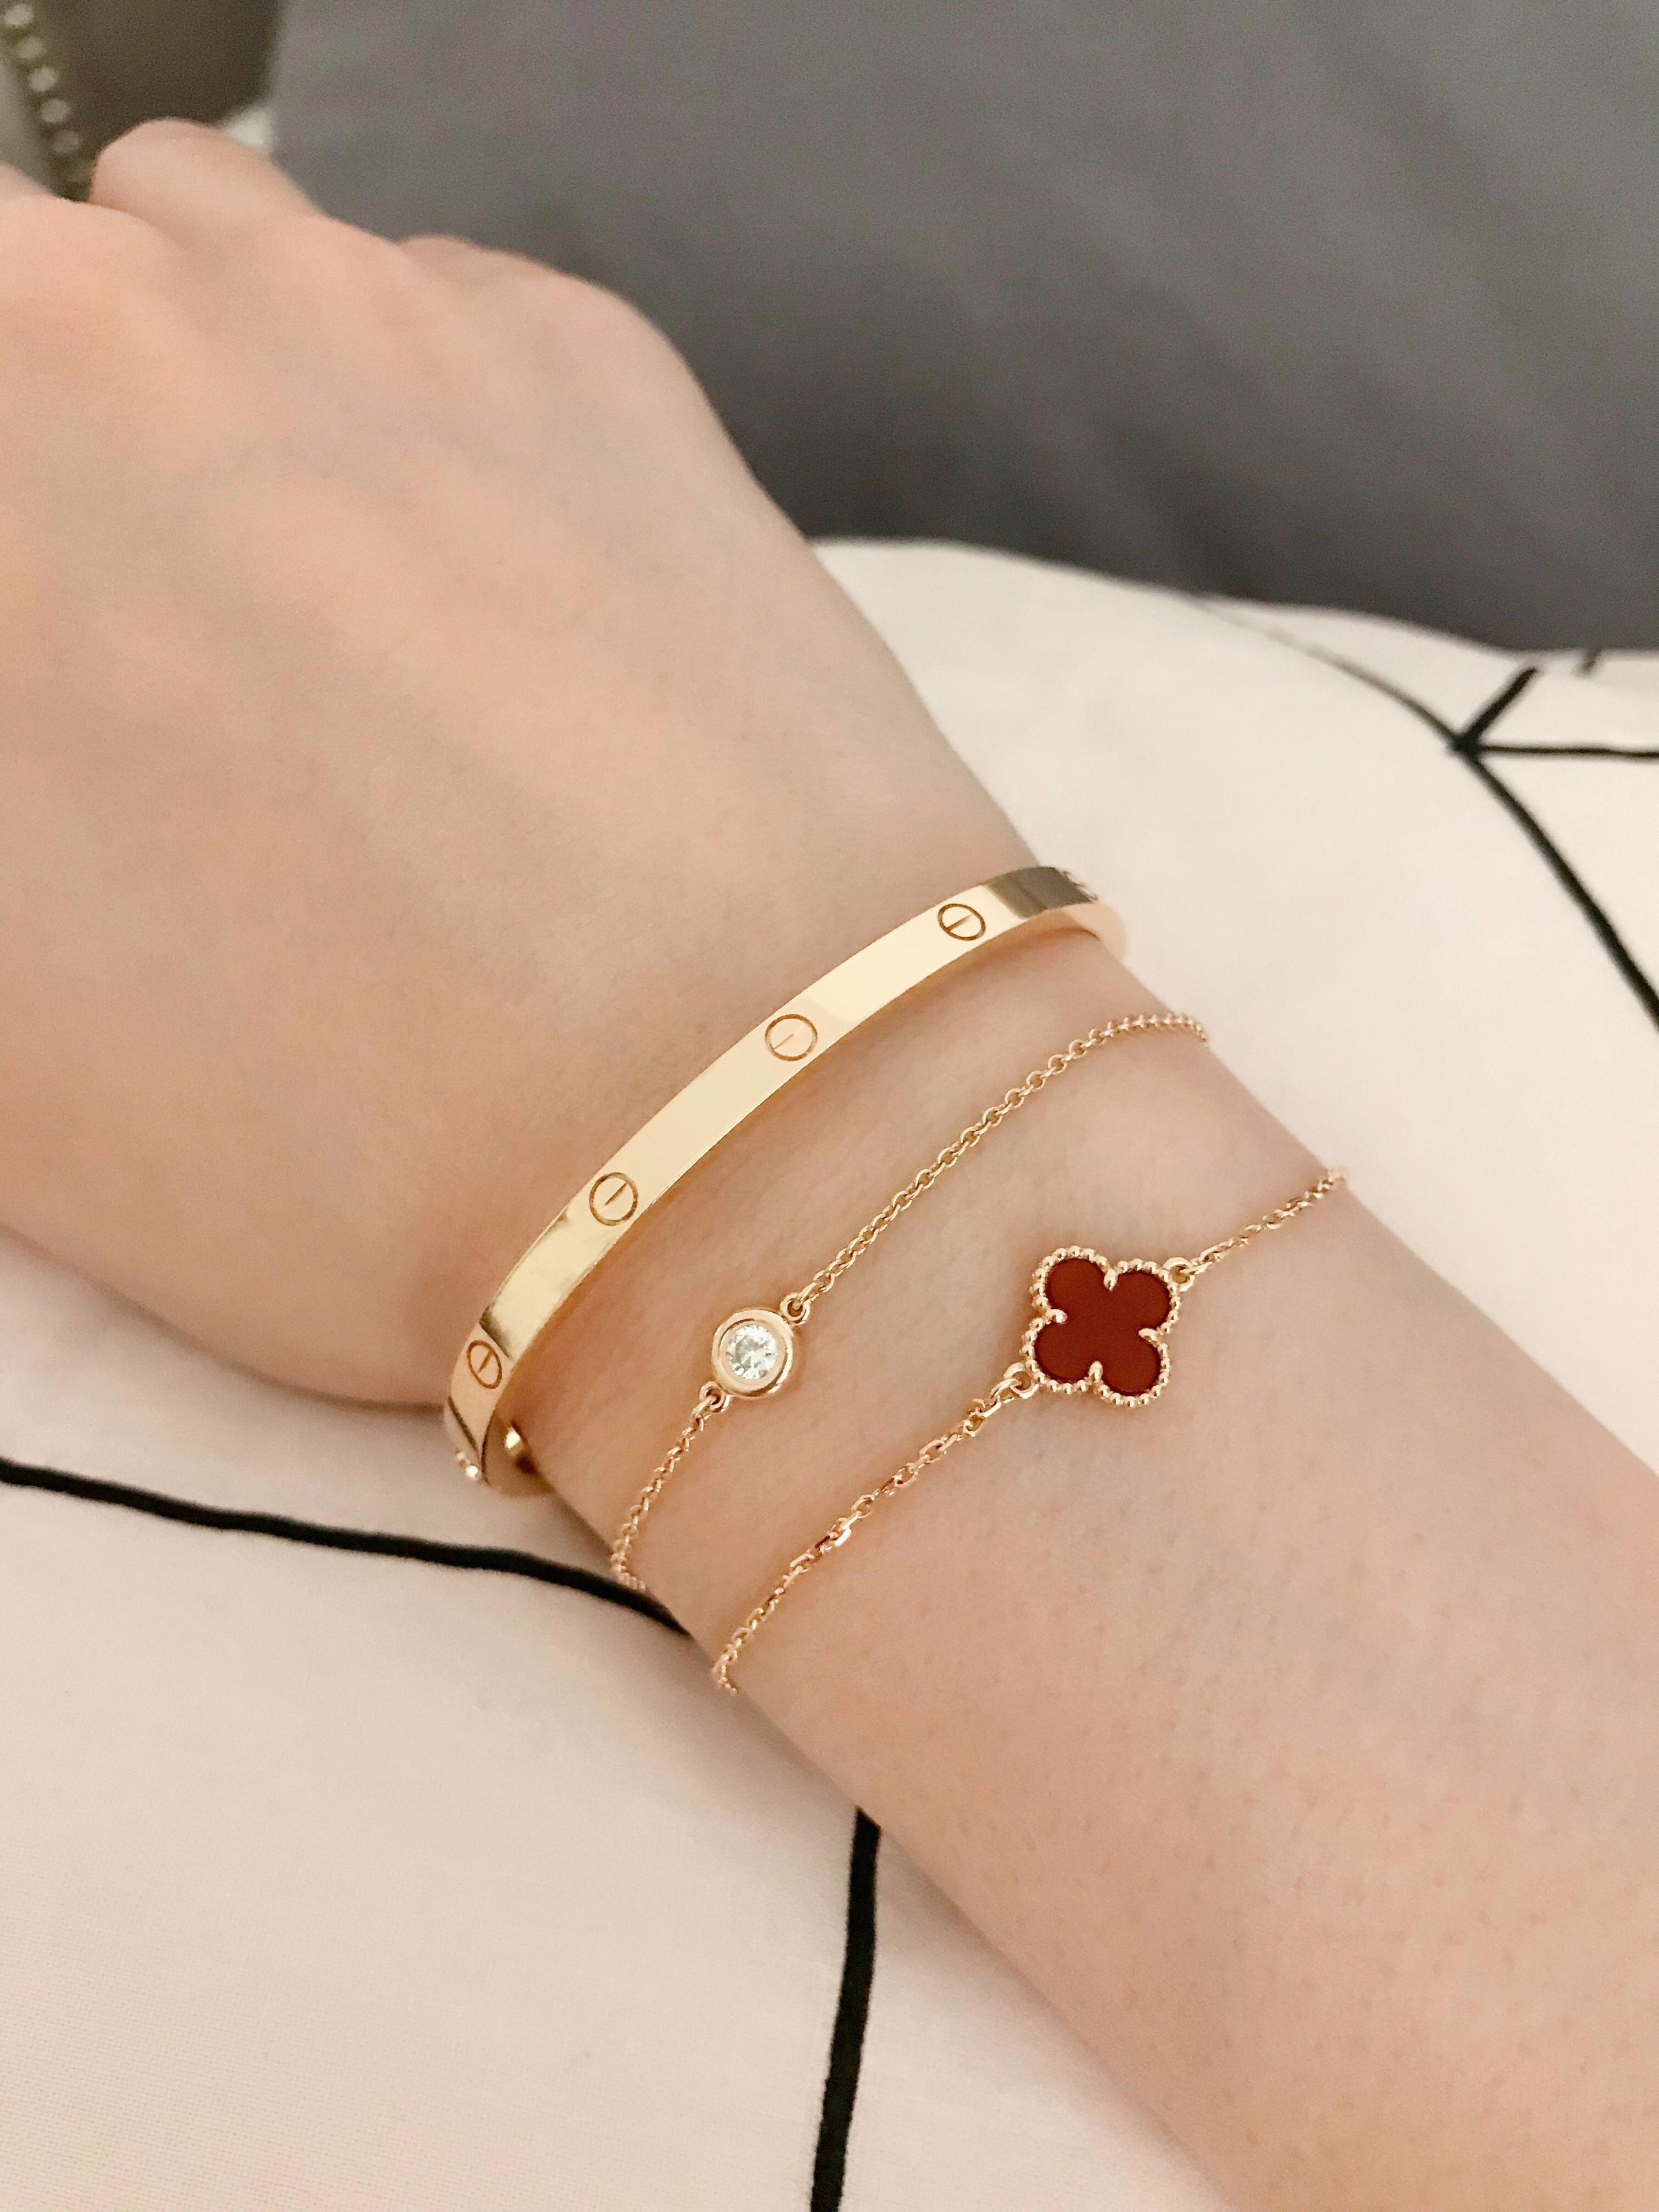 15+ High end womens jewelry info